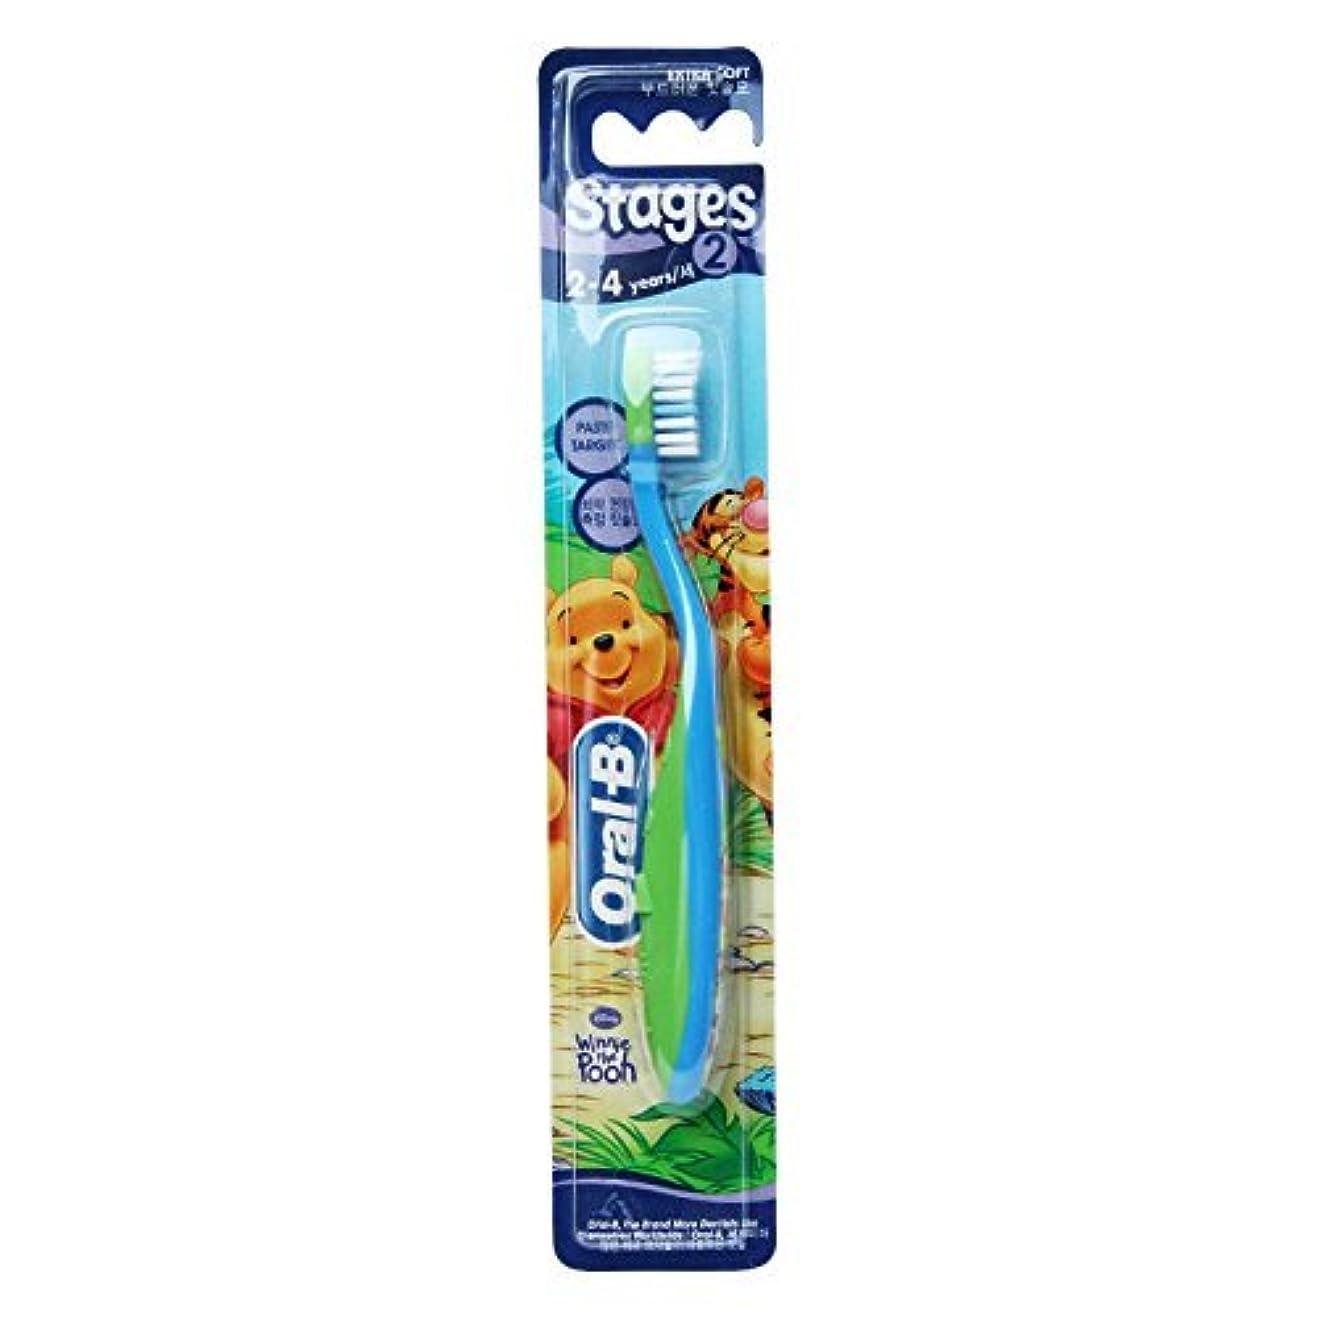 Oral-B Stages 2 Toothbrush 2 - 4 years 1 Pack /GENUINEと元の梱包 [並行輸入品]